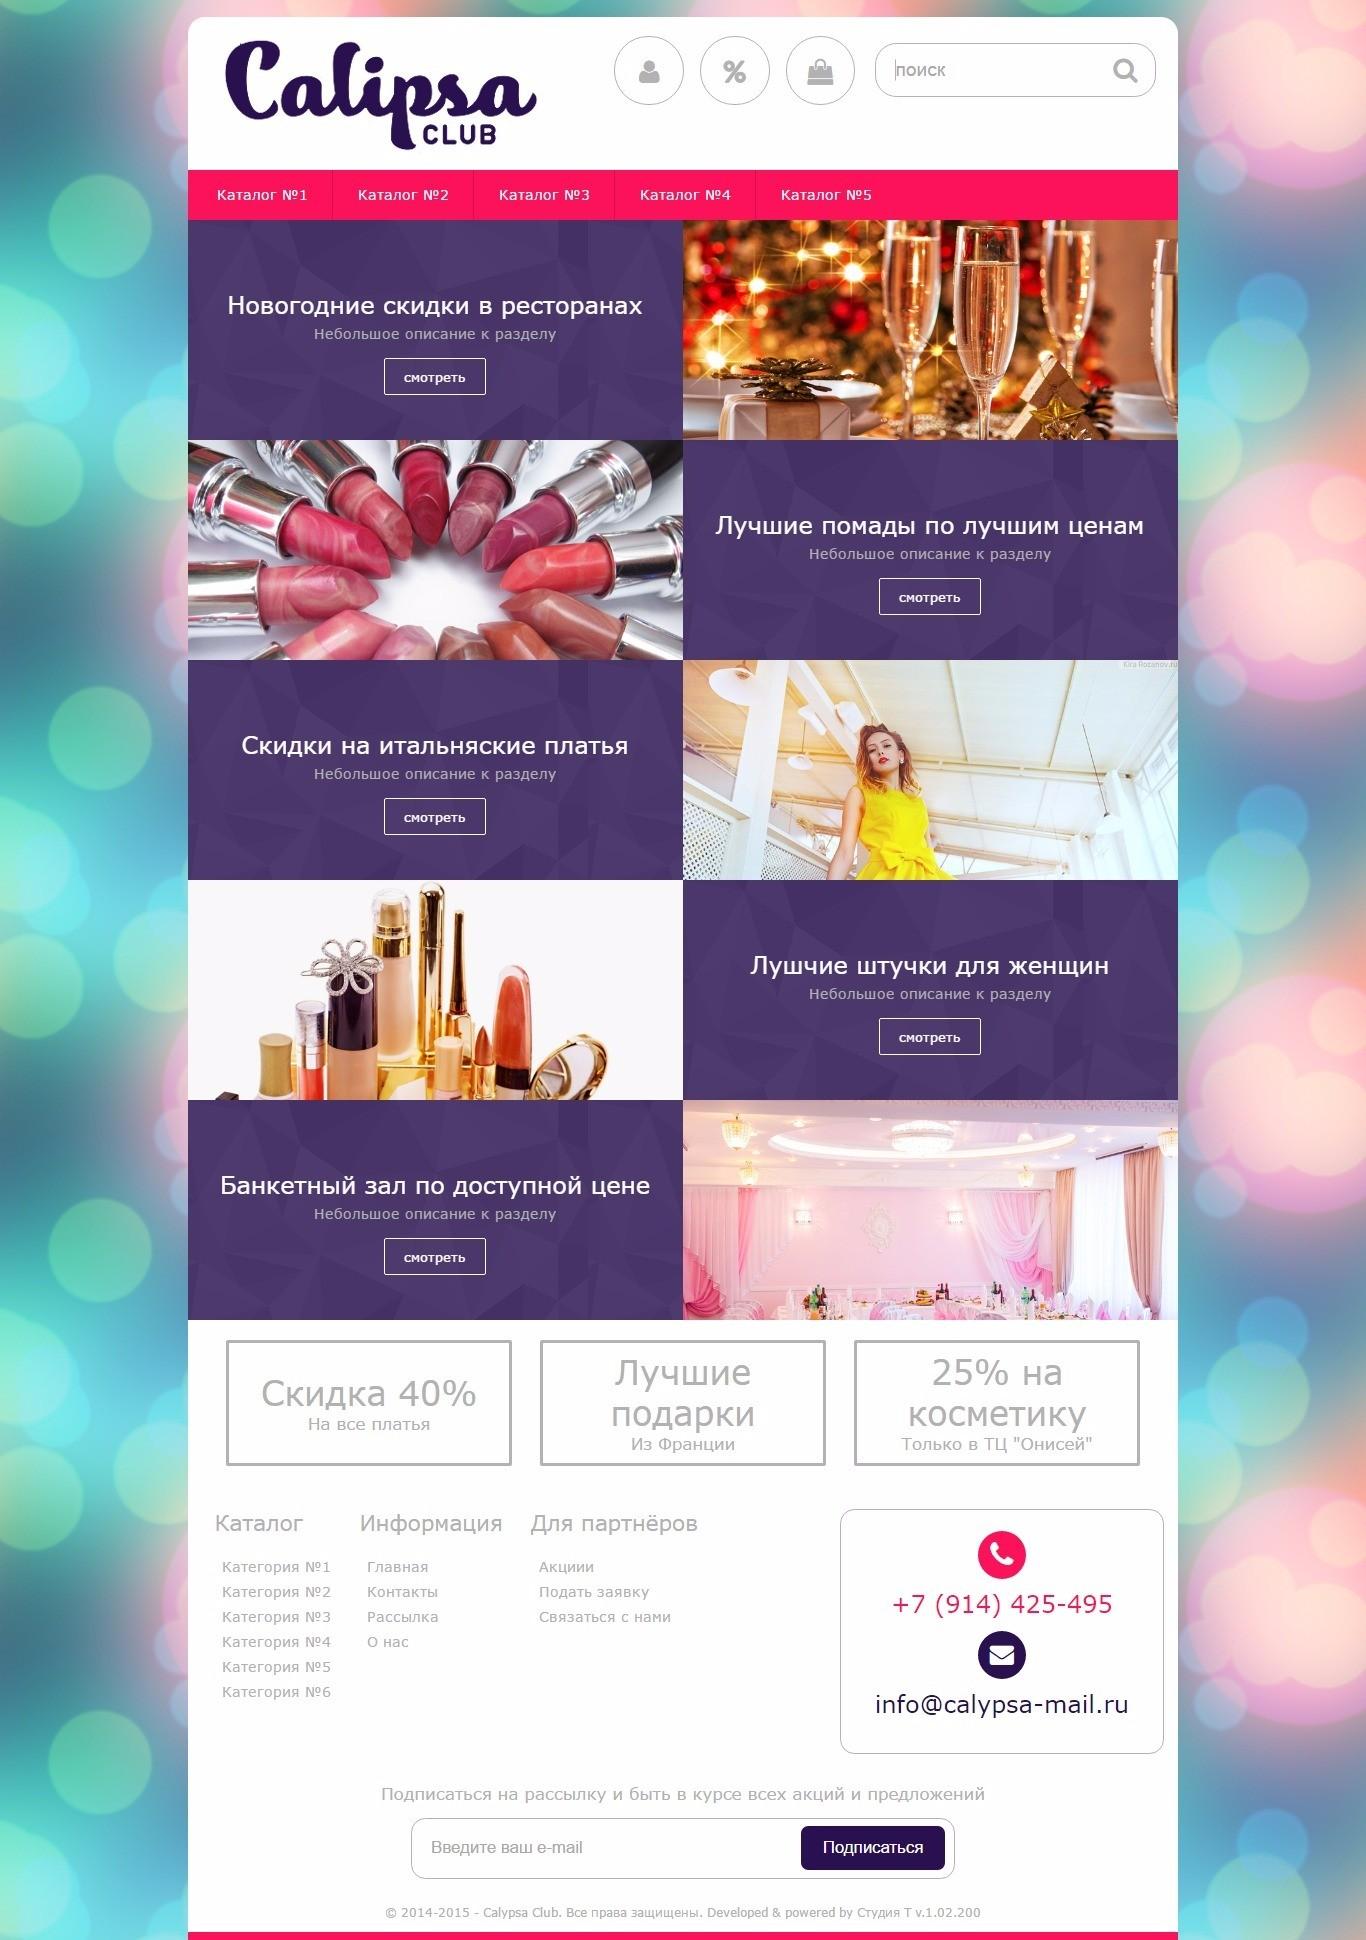 Calypsa Club - концепт веб-сайта